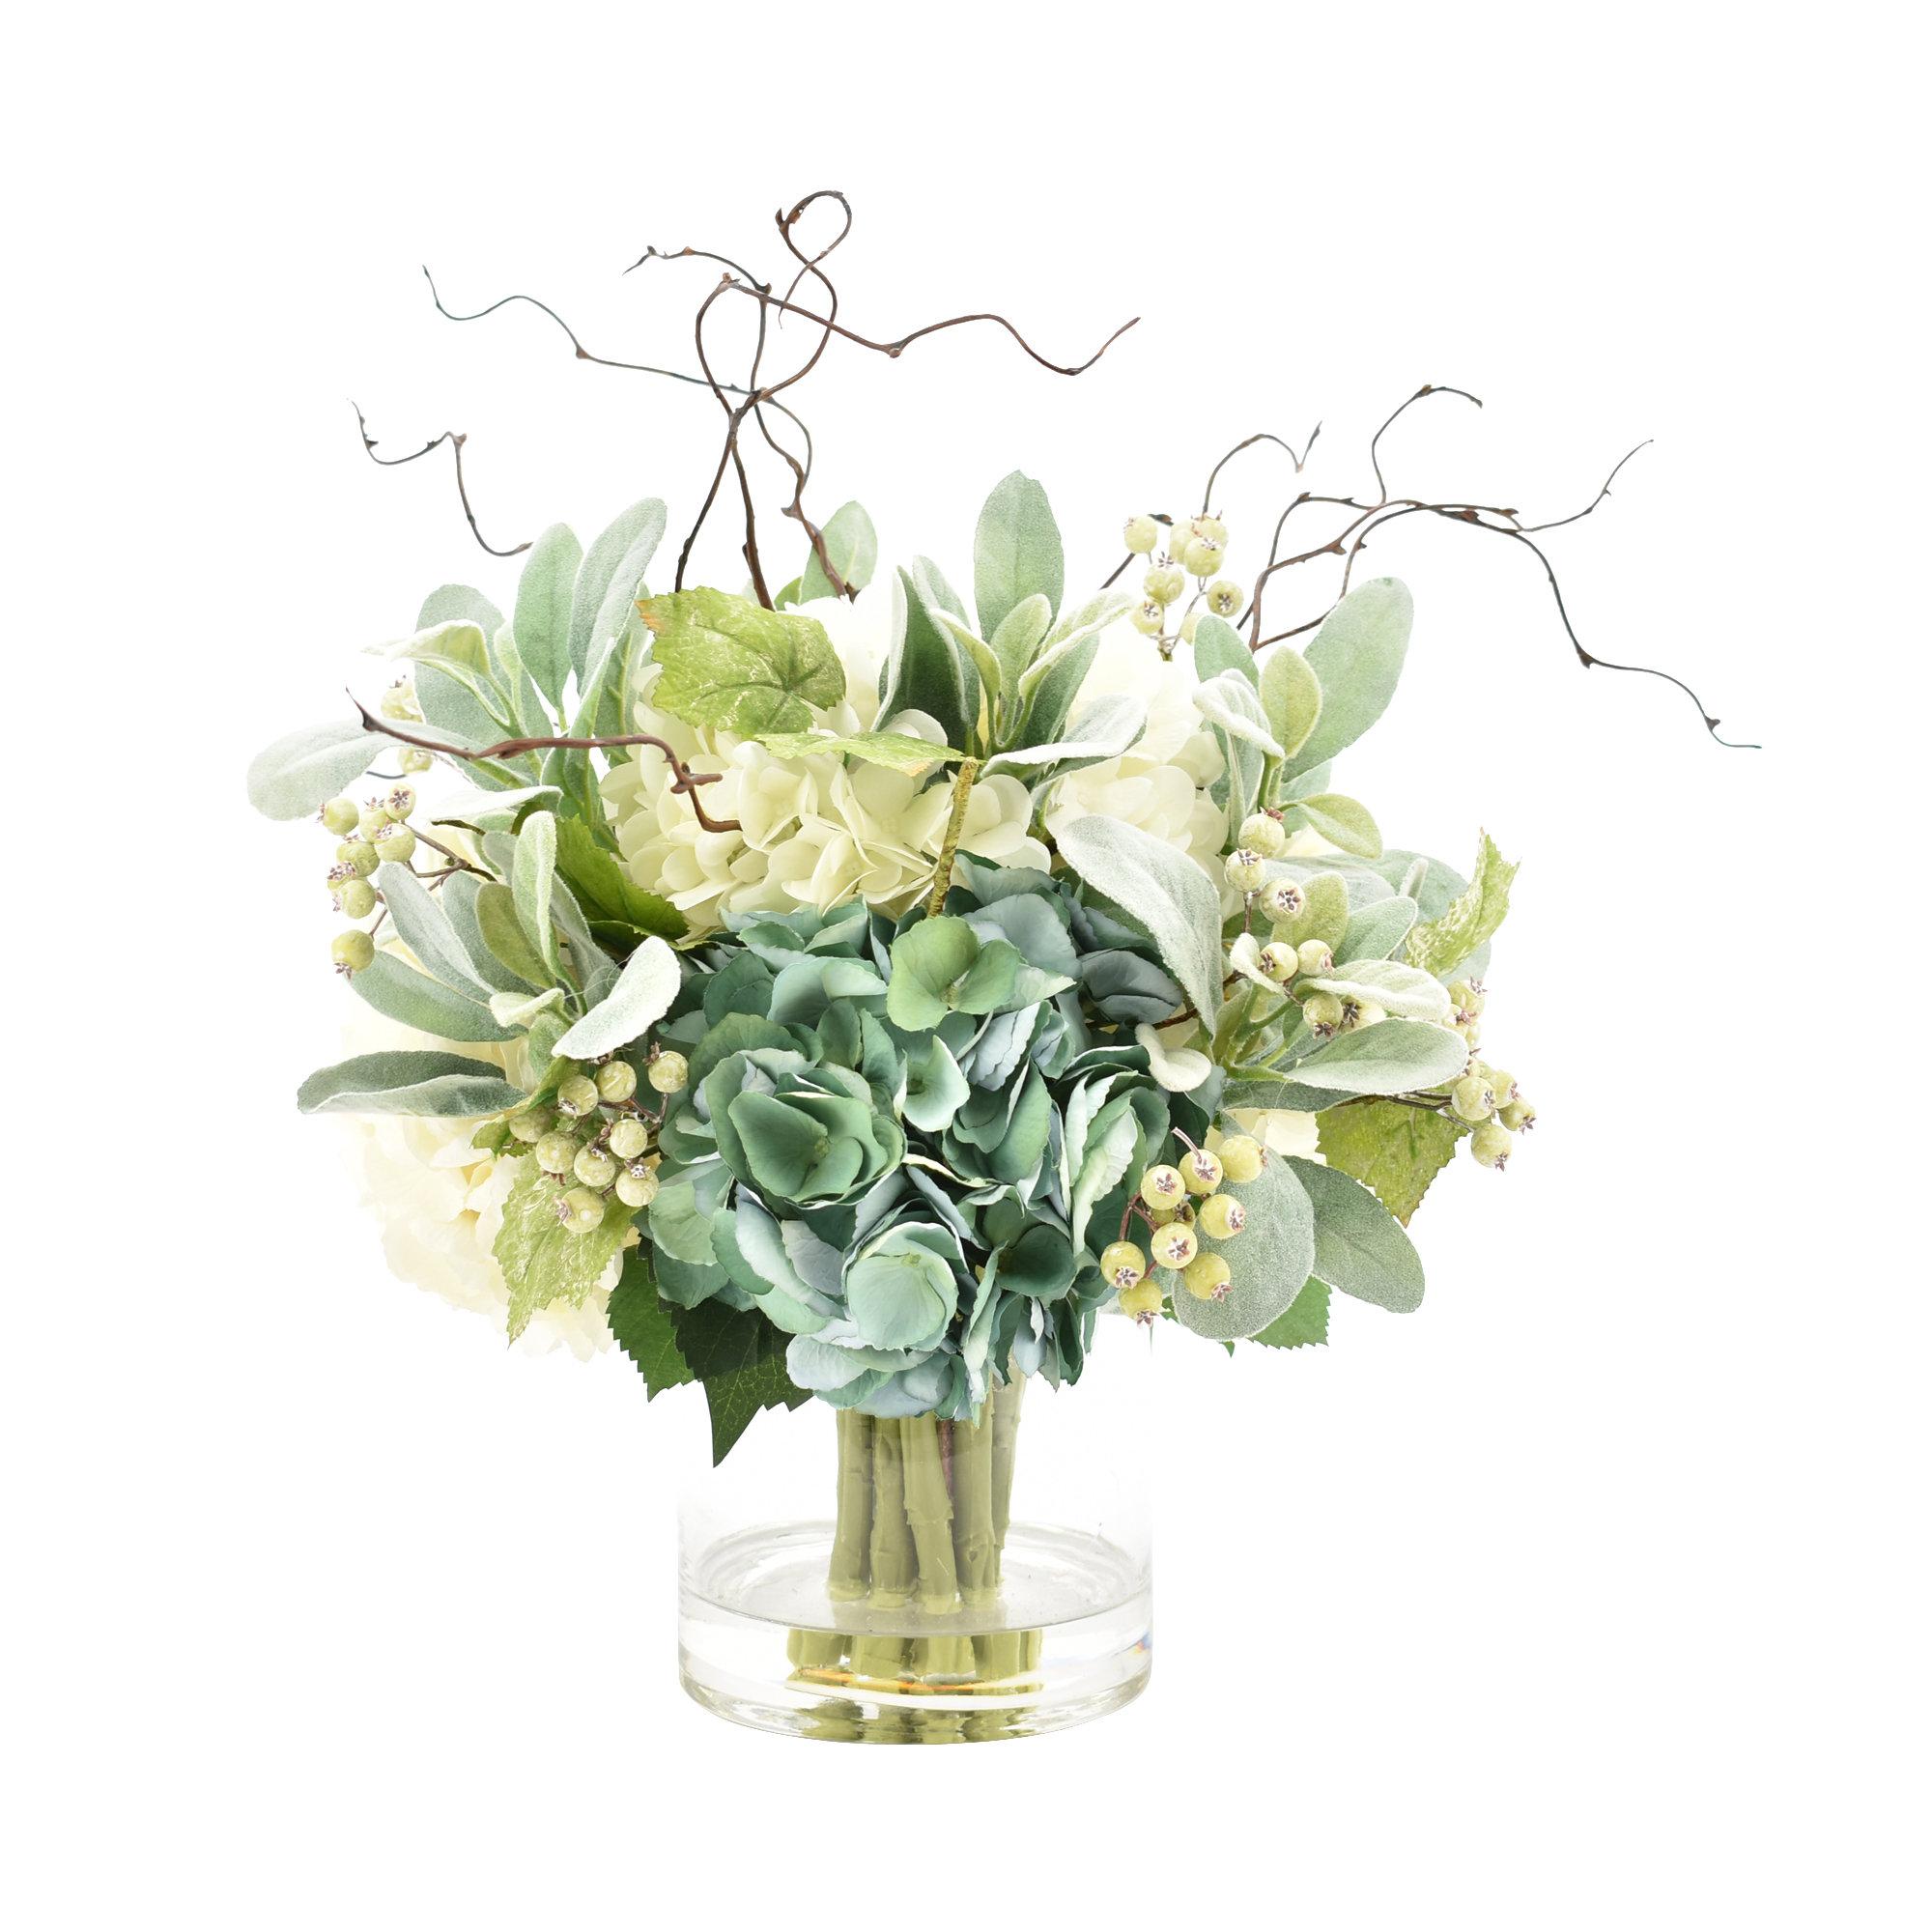 b56b10f7aba9 Hydrangeas Floral Arrangement in Glass Vase   Reviews